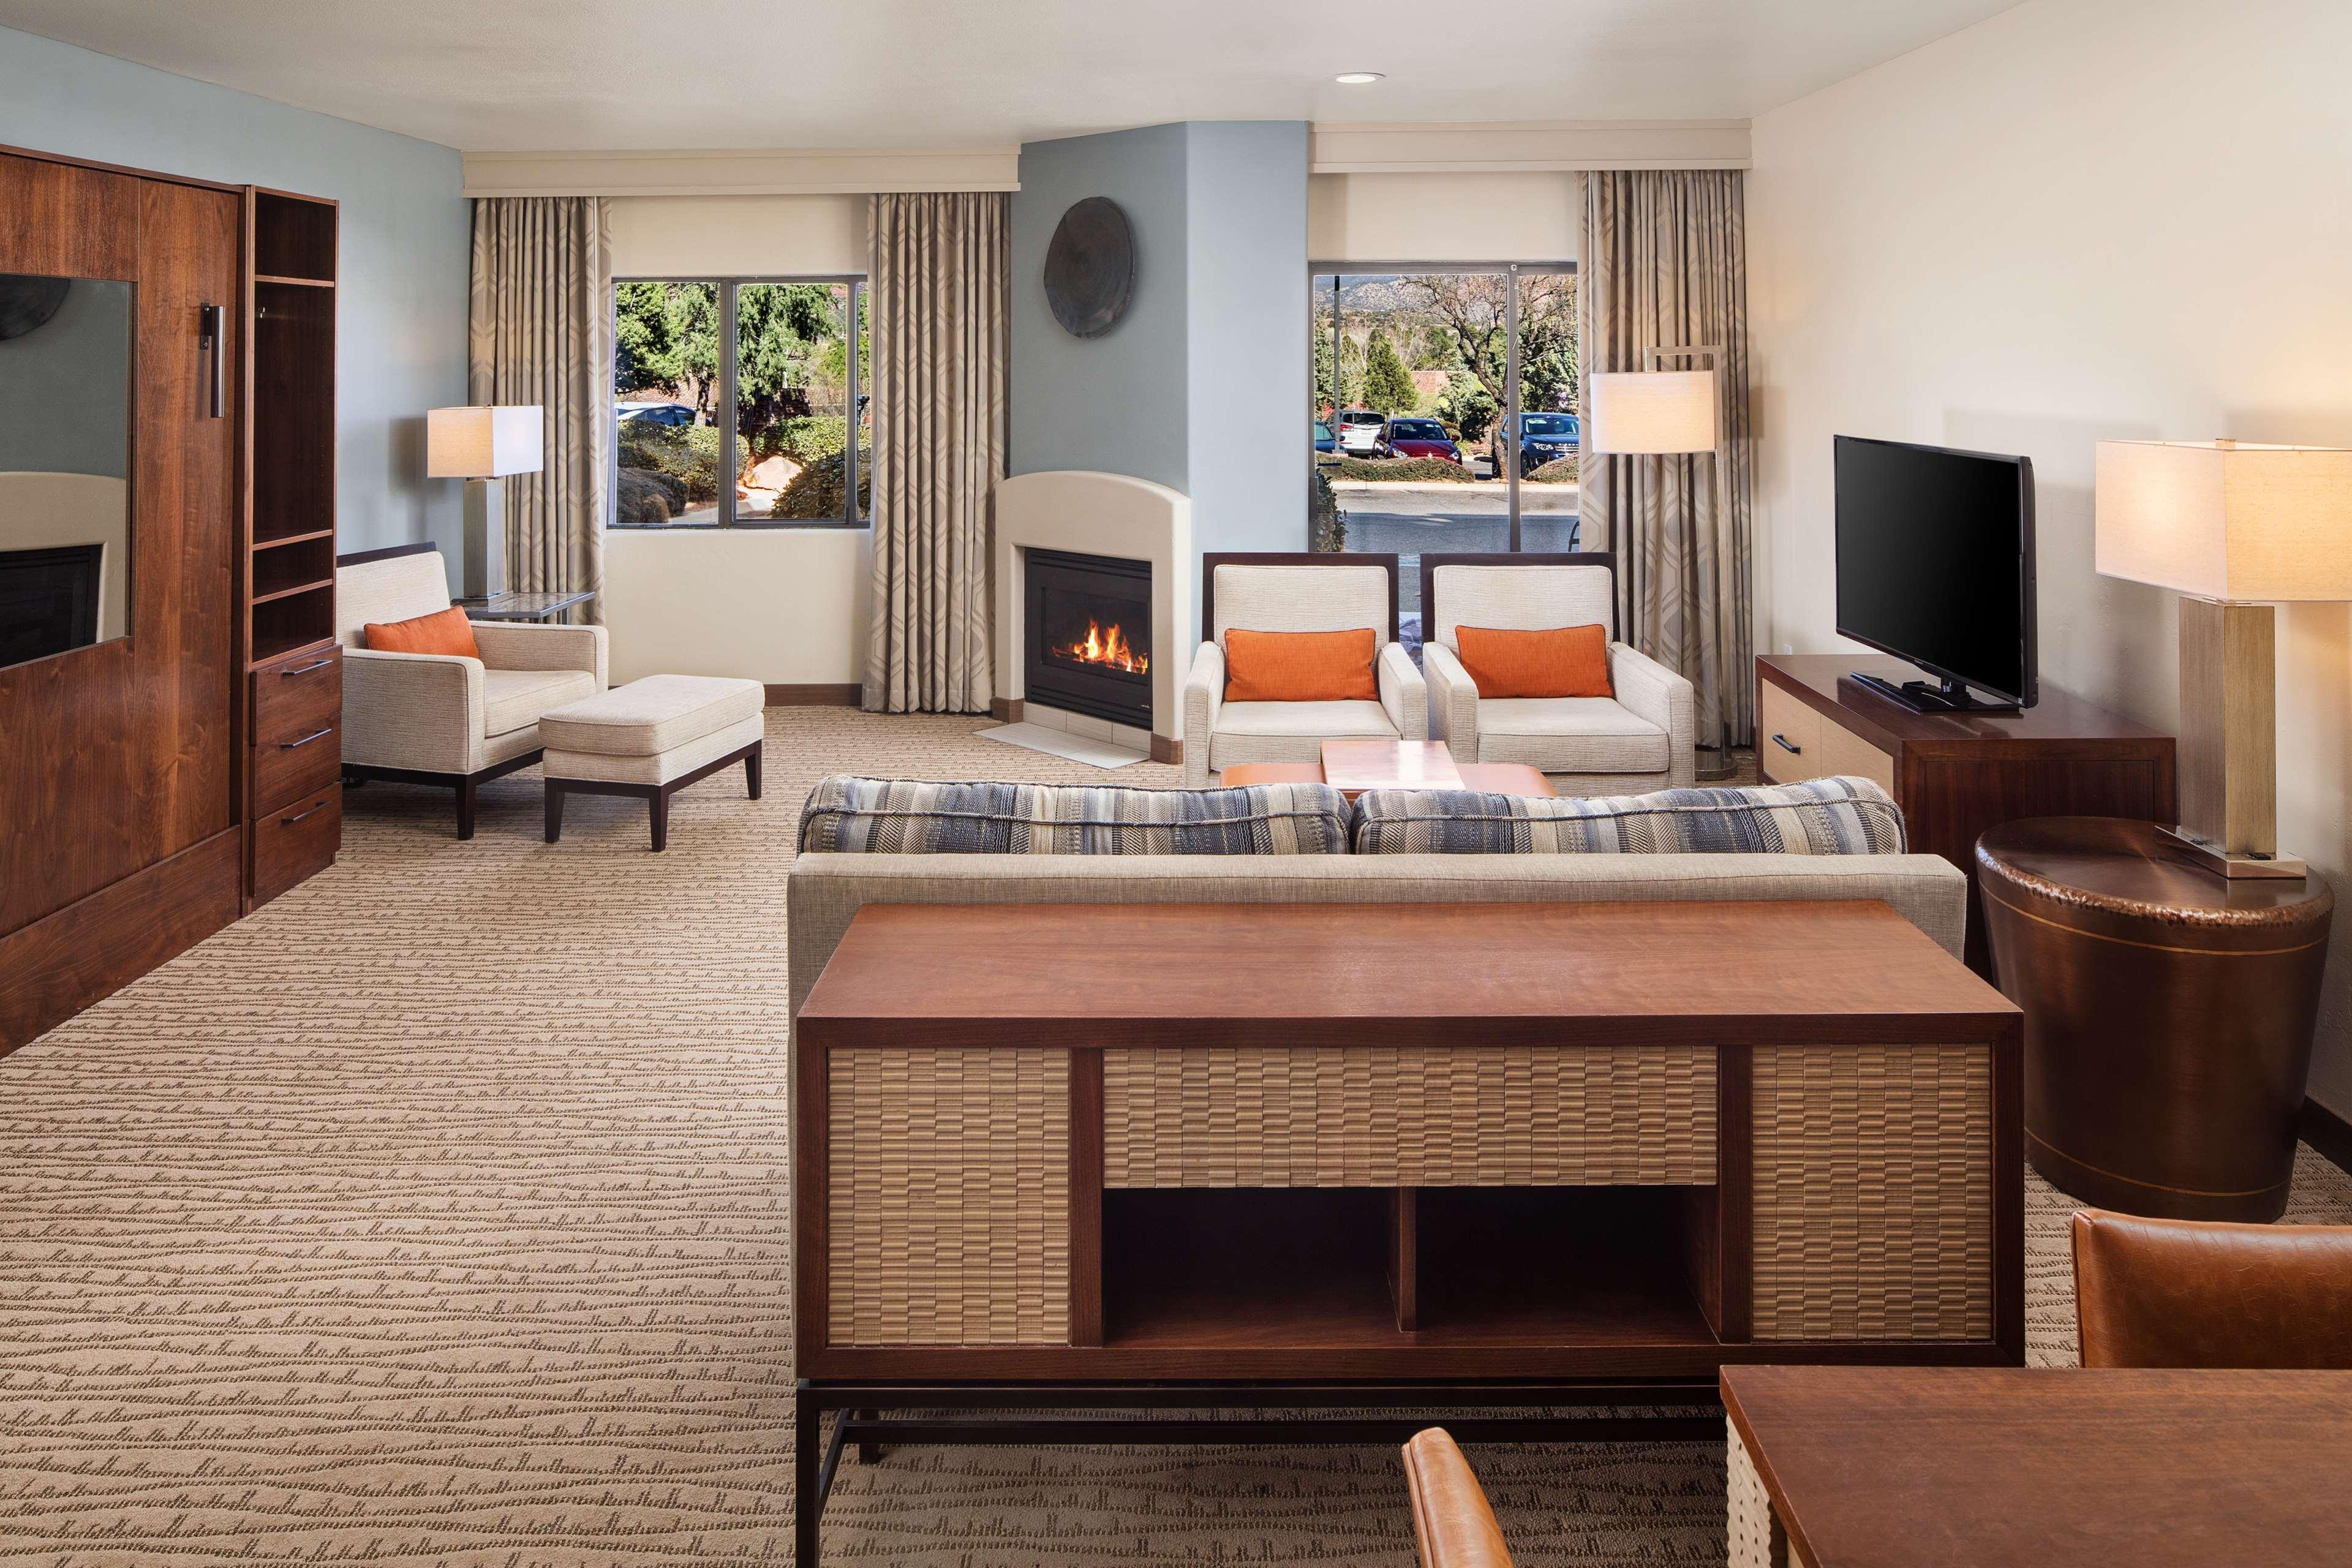 Hilton Sedona Resort at Bell Rock image 45